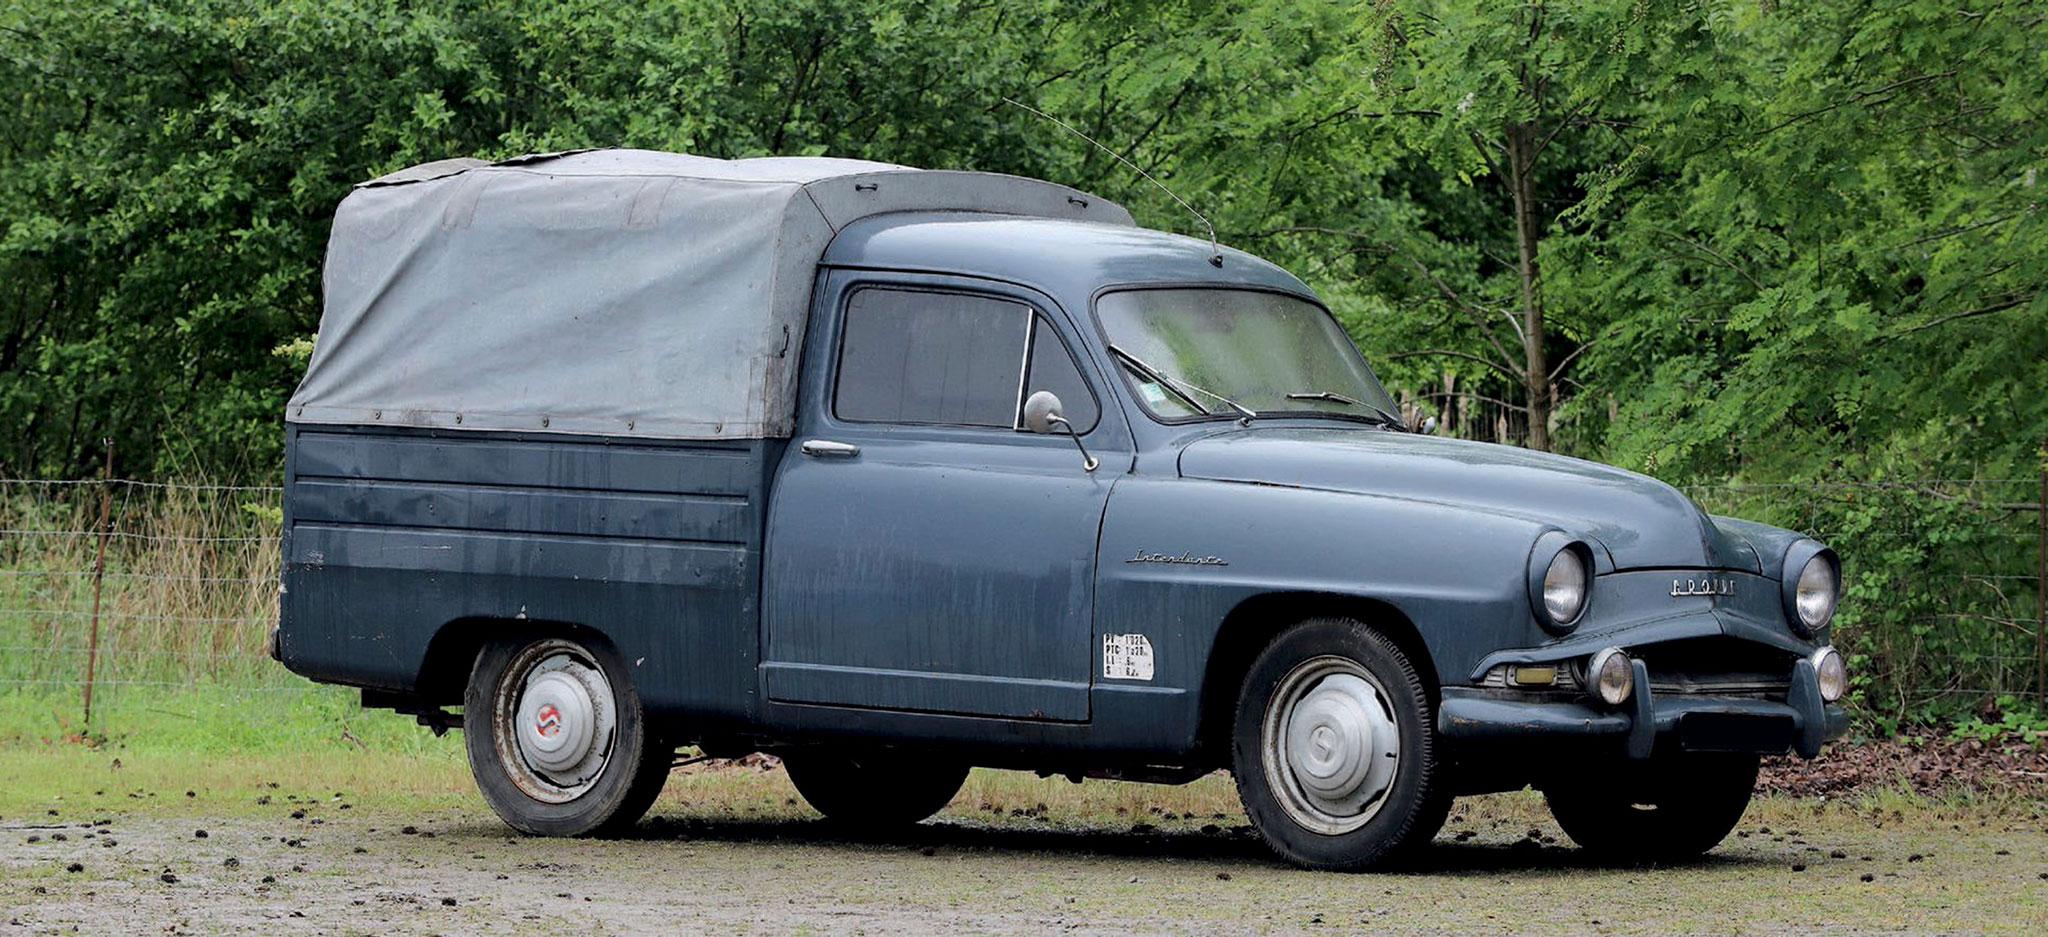 1957 Simca Aronde 90 Intendante €2000 - 4000 - Populaires Françaises.